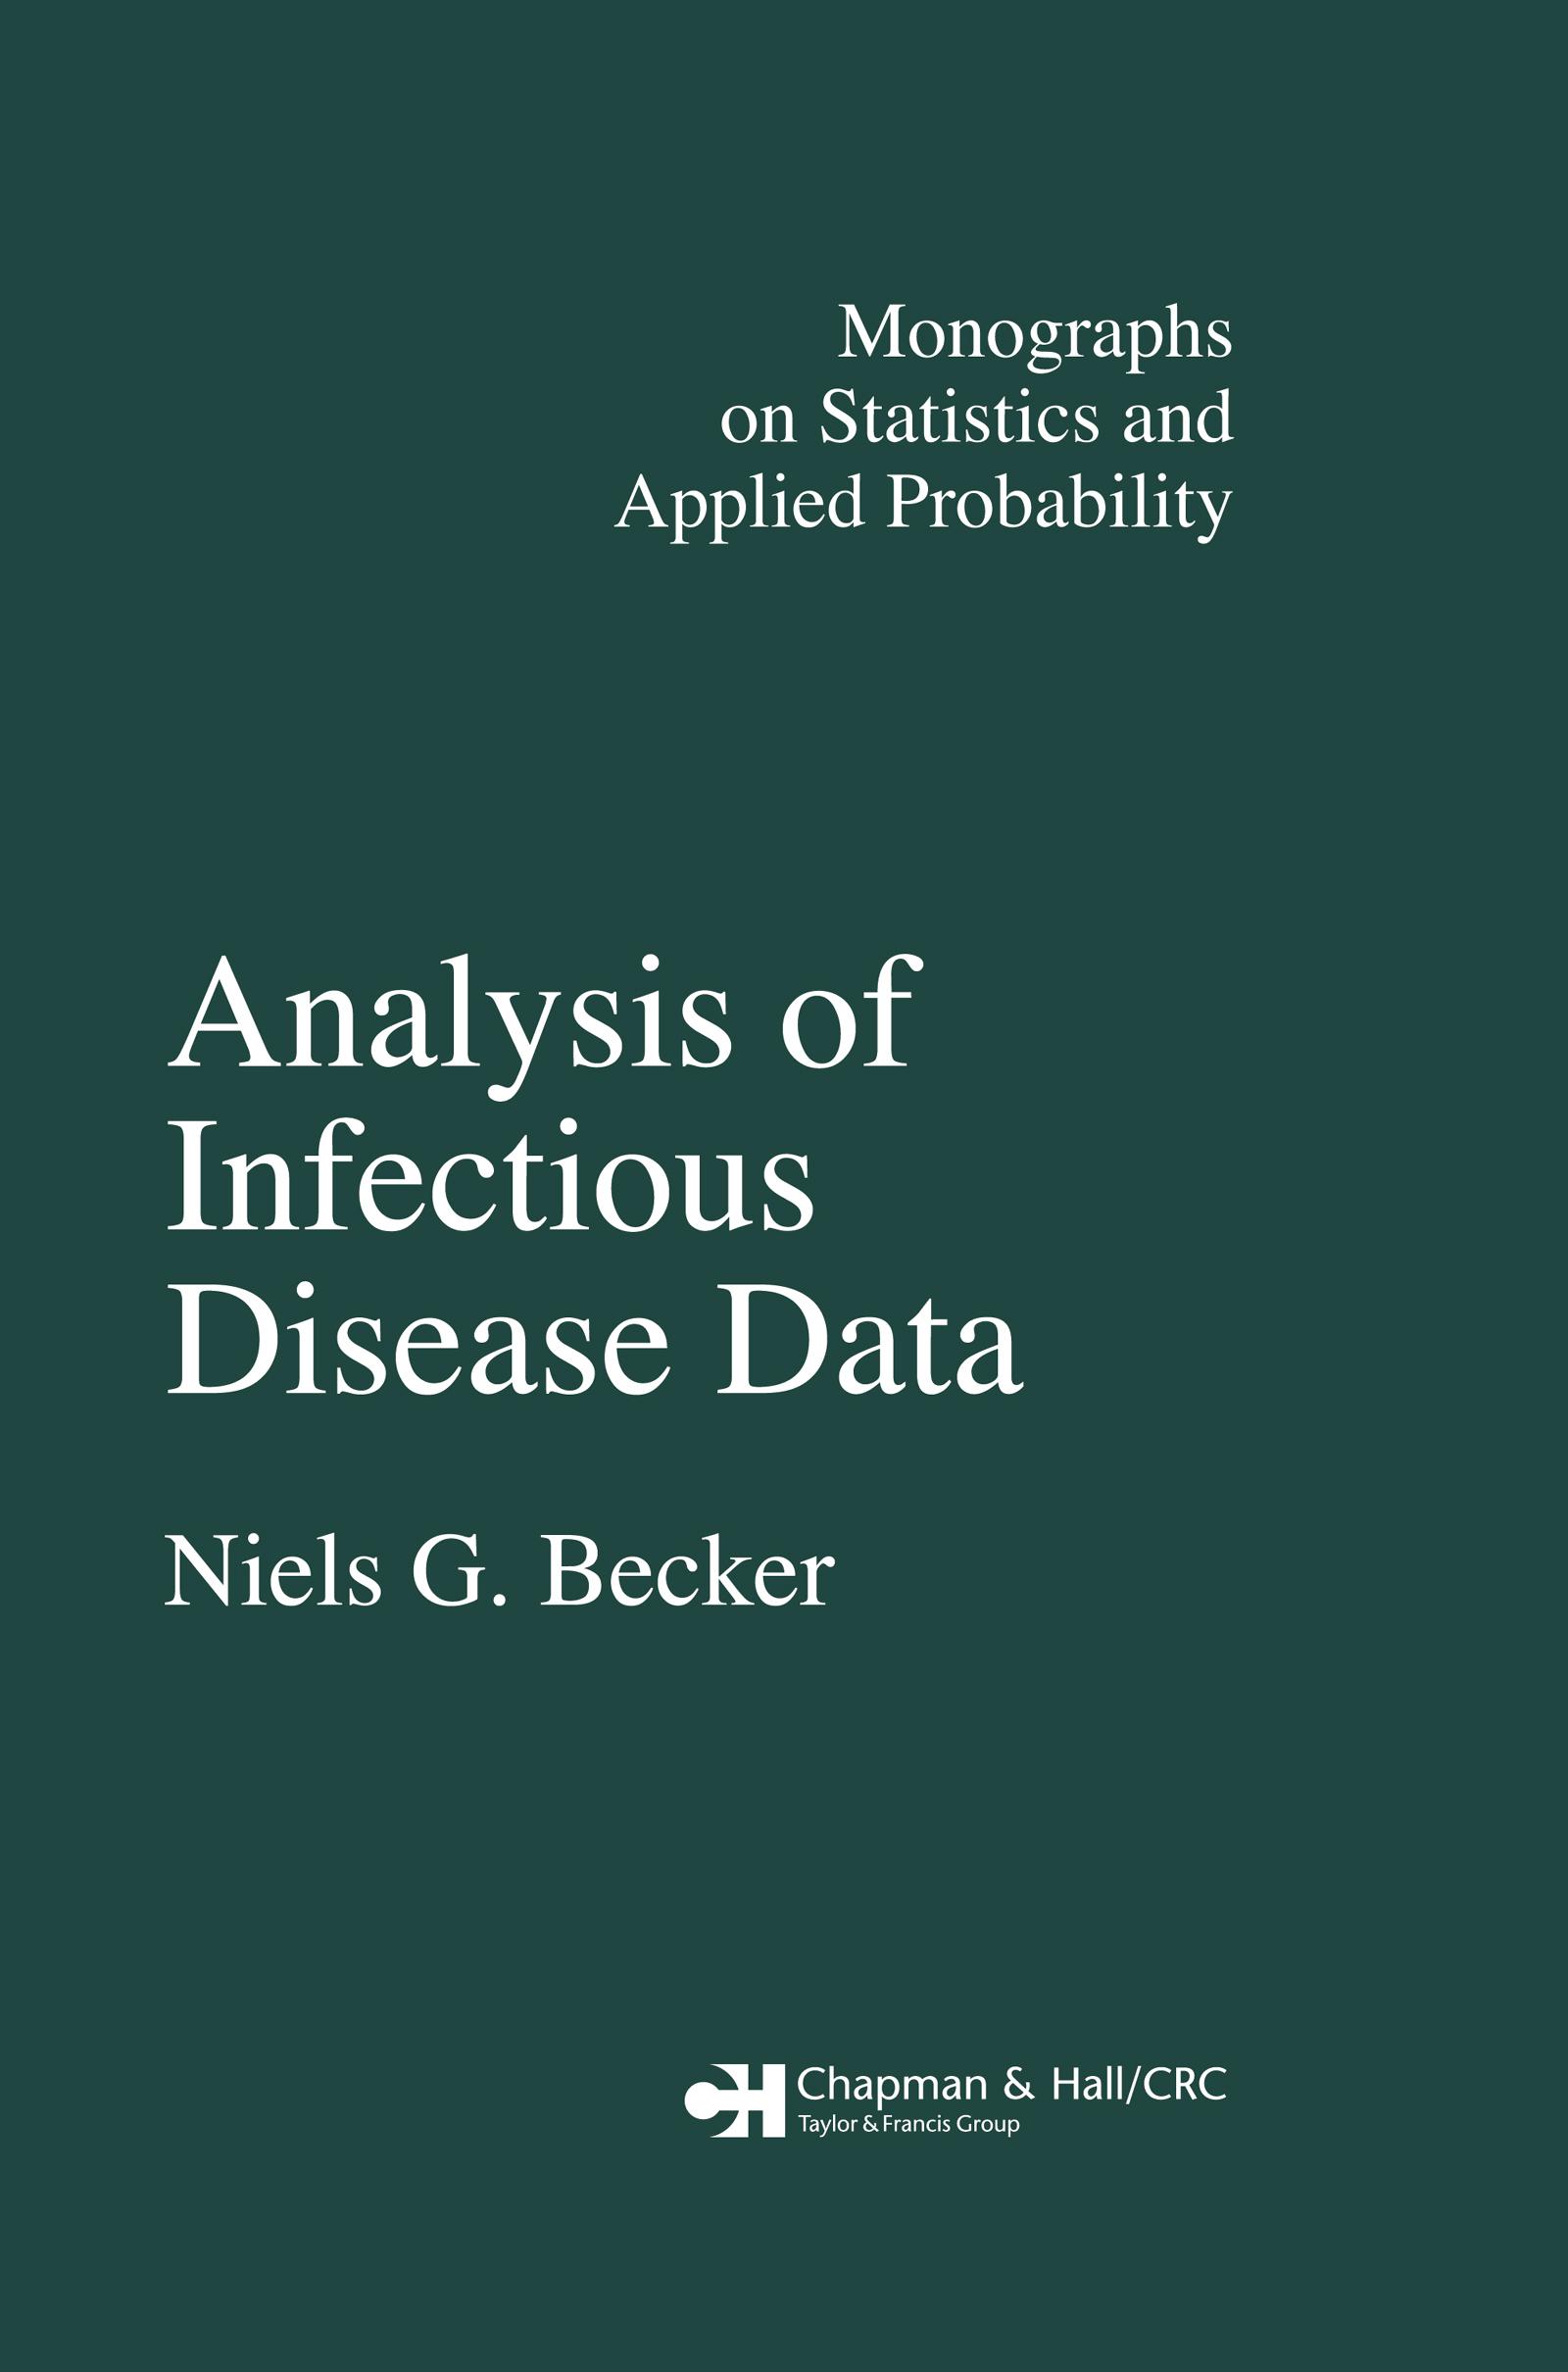 Analysis of Infectious Disease Data